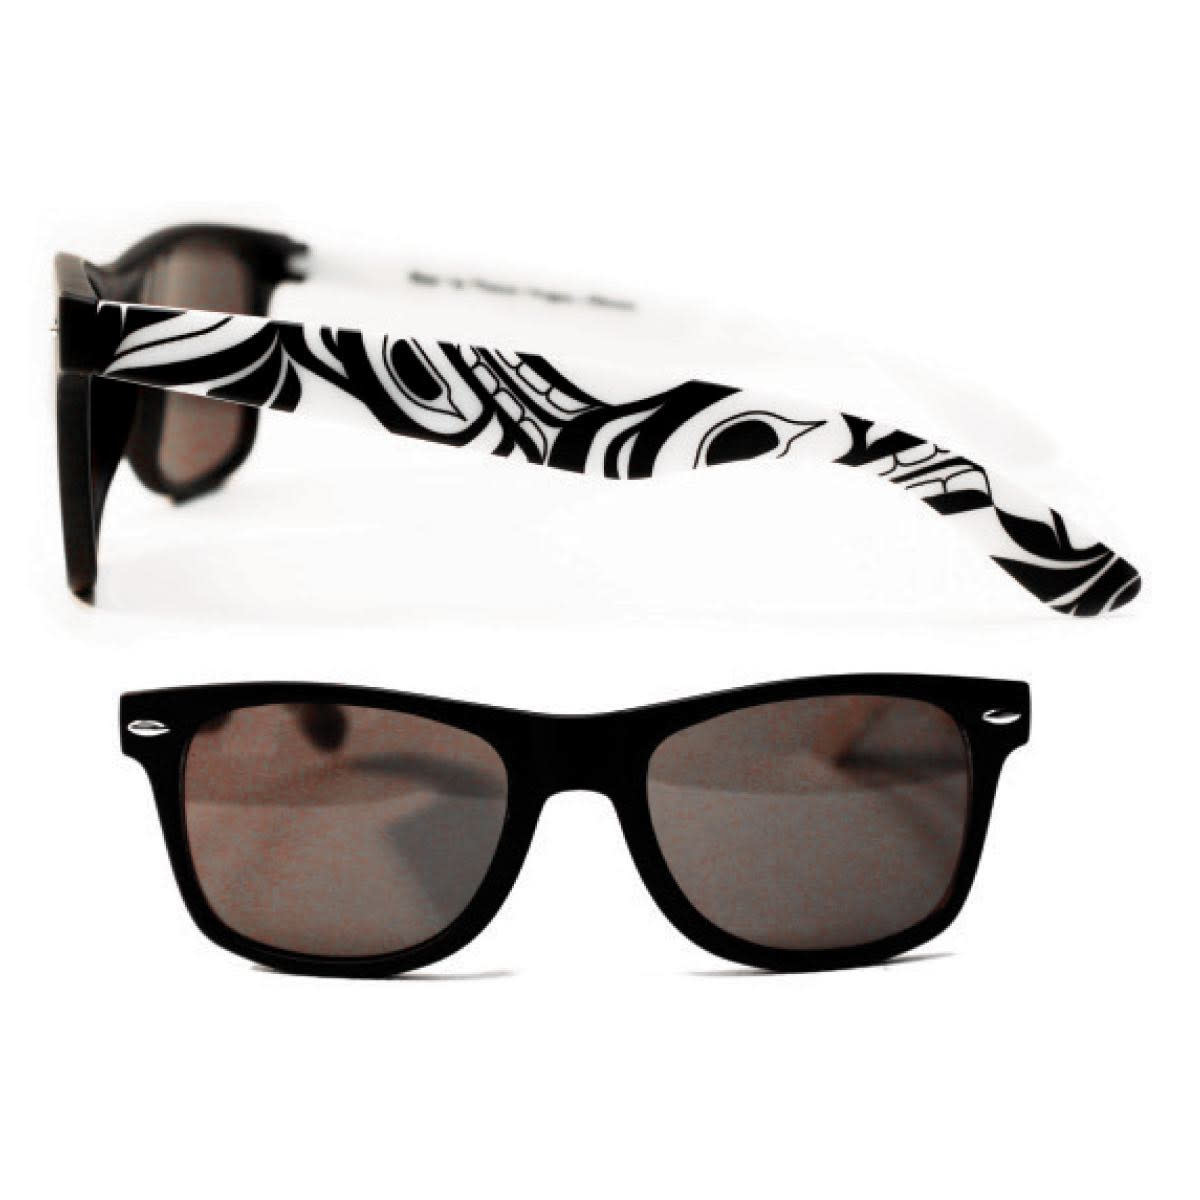 SunGlasses - Adult-1